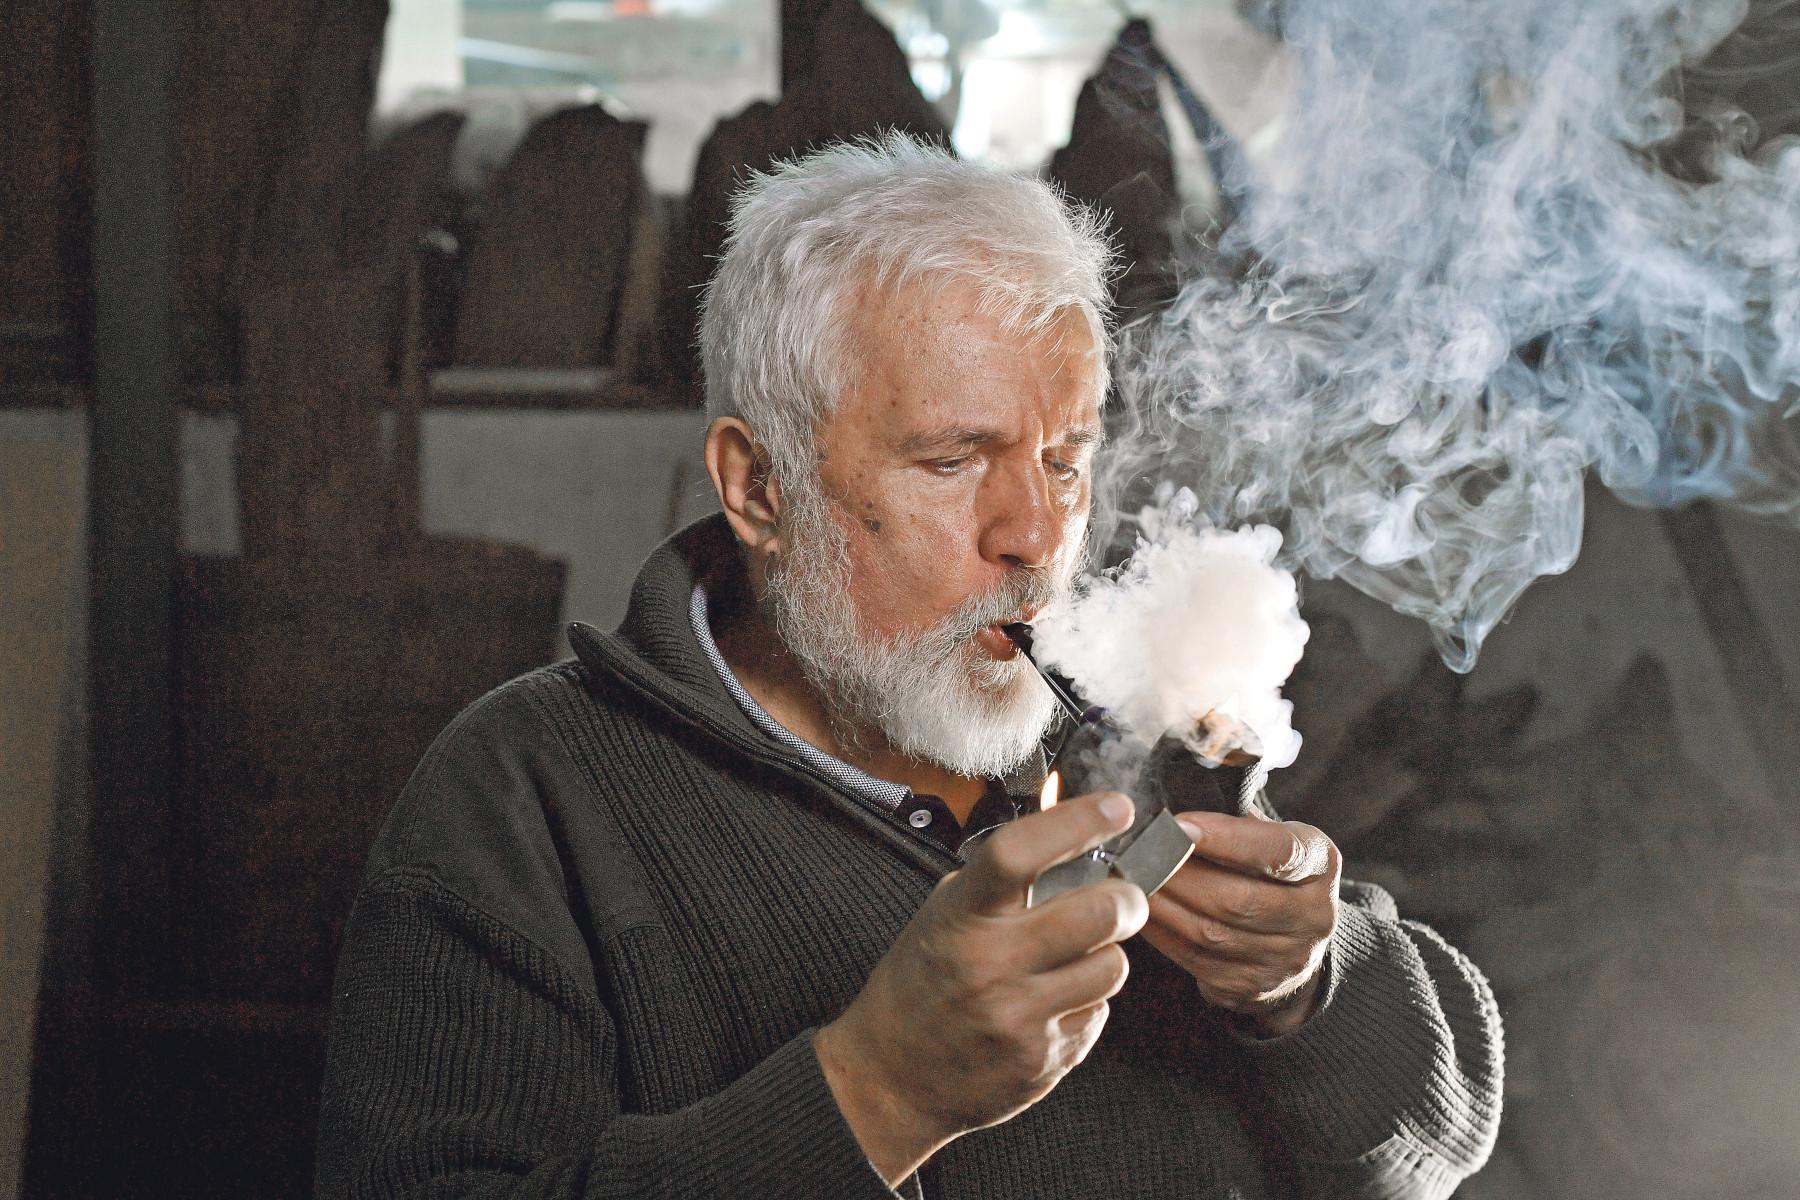 Zagreb, 271119. Davorin Djenovic koji vec deset godina izradjuje lule za pusenje duhana, fotografiran u svojoj radionici. Foto: Boris Kovacev / CROPIX